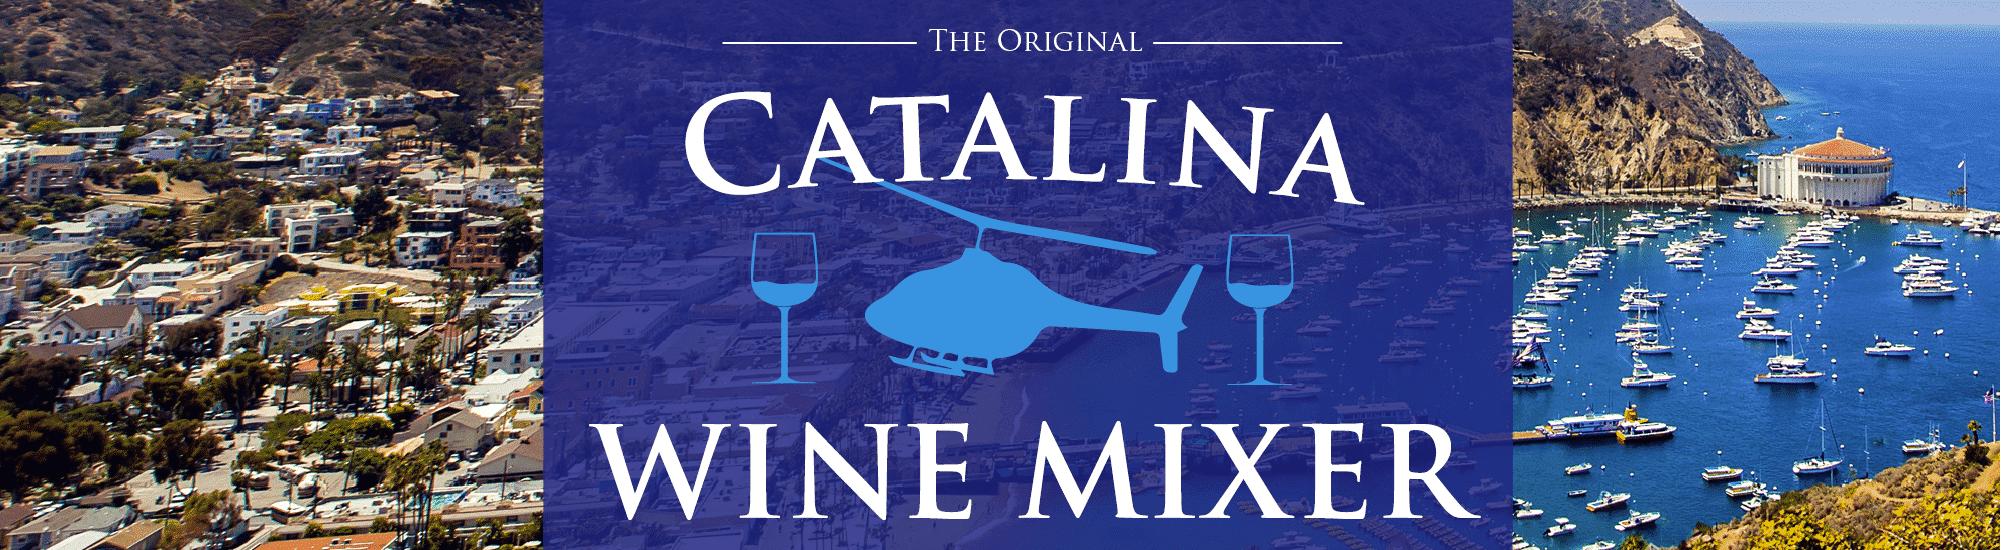 The Catalina Wine Mixer Cannabis Strain